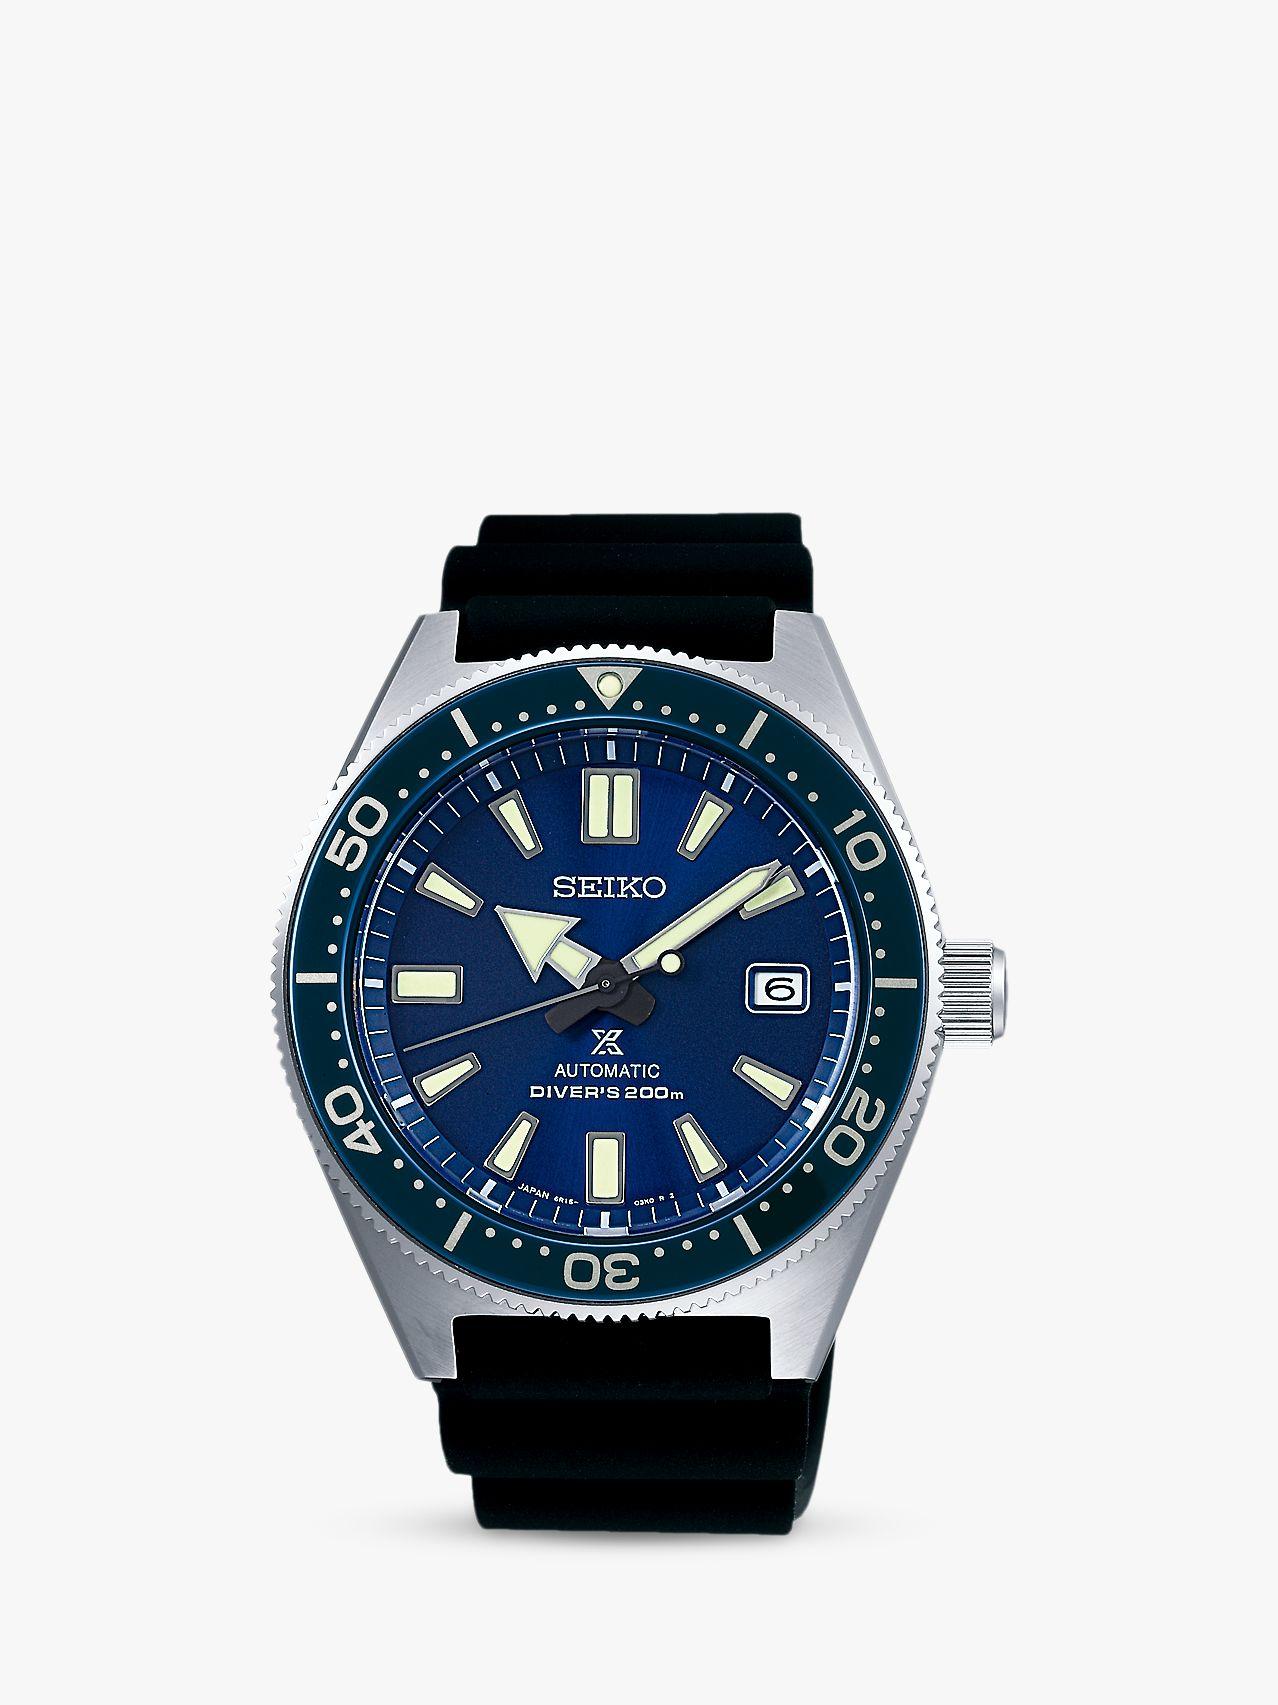 Seiko Seiko SPB053J1 Men's Original Date Automatic Silicone Strap Watch, Black/Blue